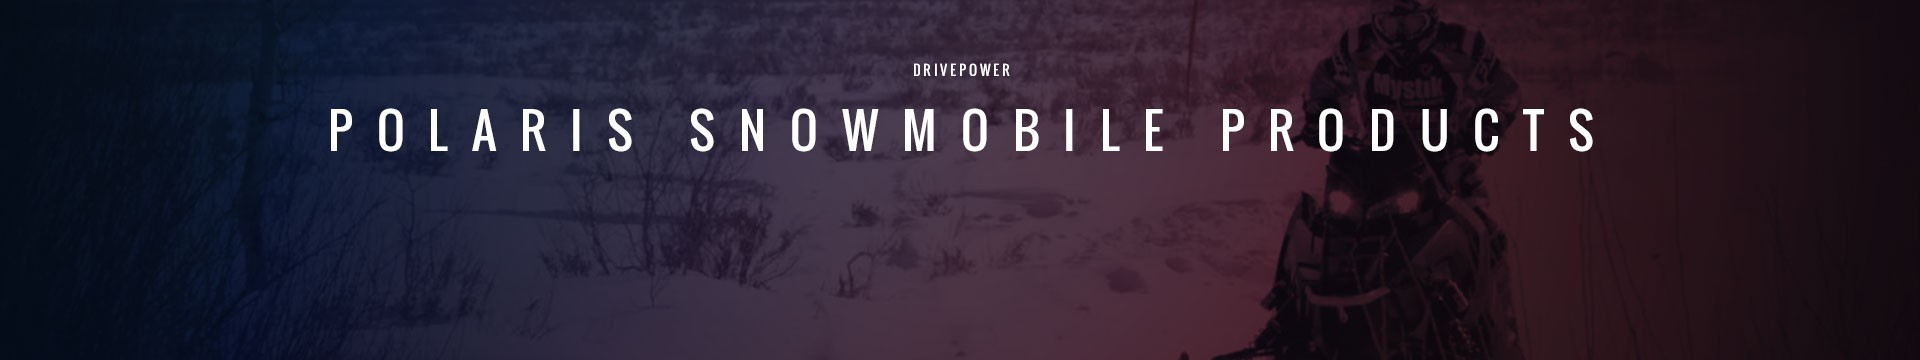 Drivepower Polaris Snowmobile Products